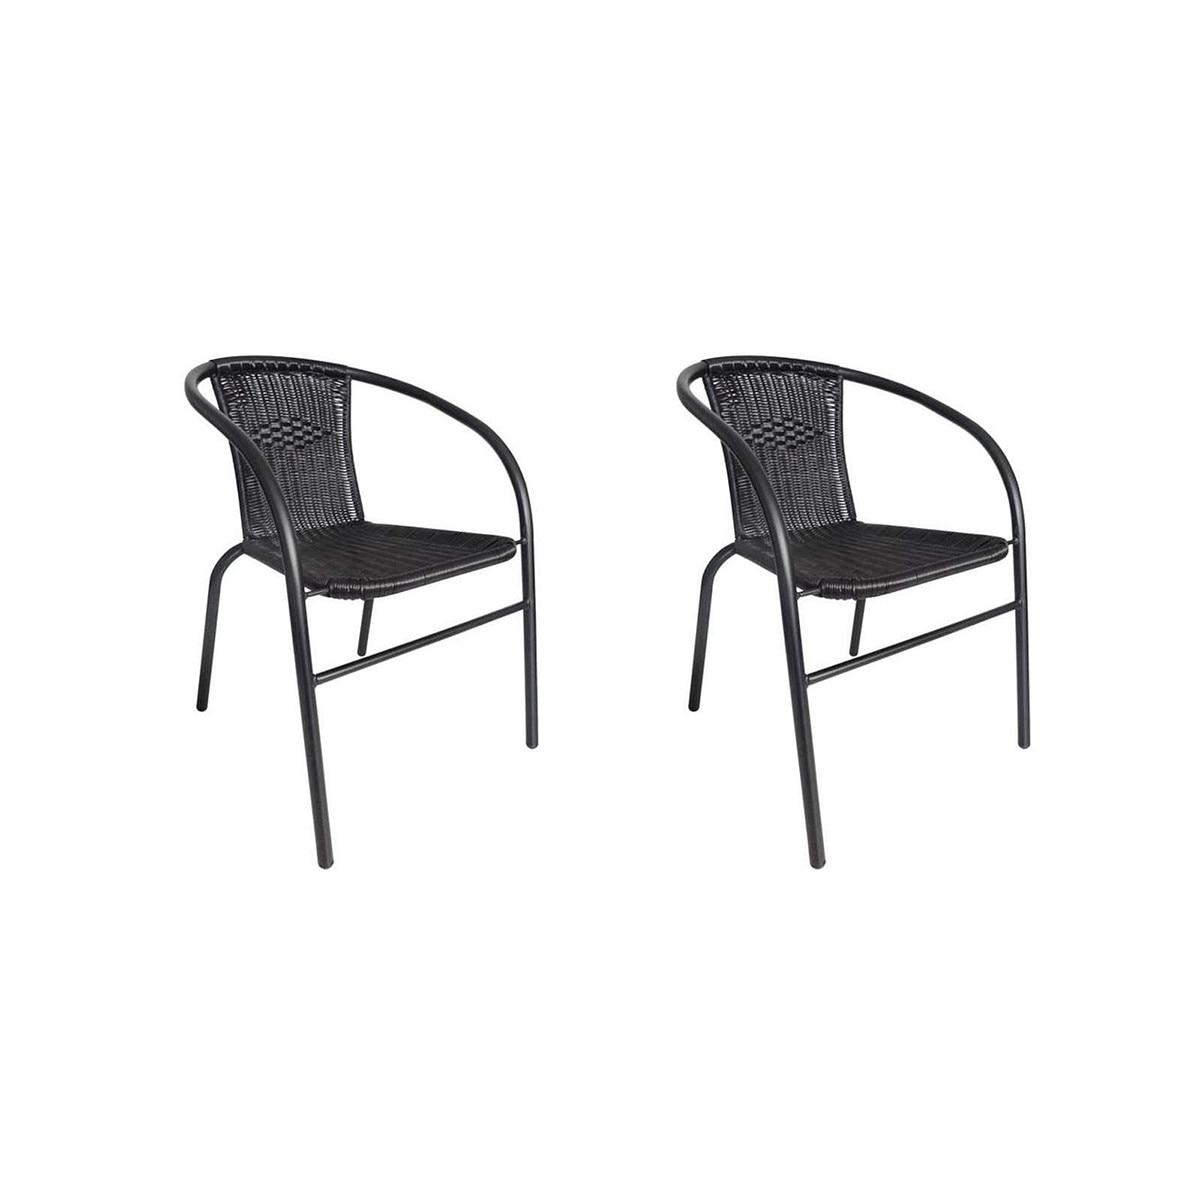 Set 2 scaune rattan si metal pentru curte, gradina, terasa sau balcon, stivuibil, culoare negru